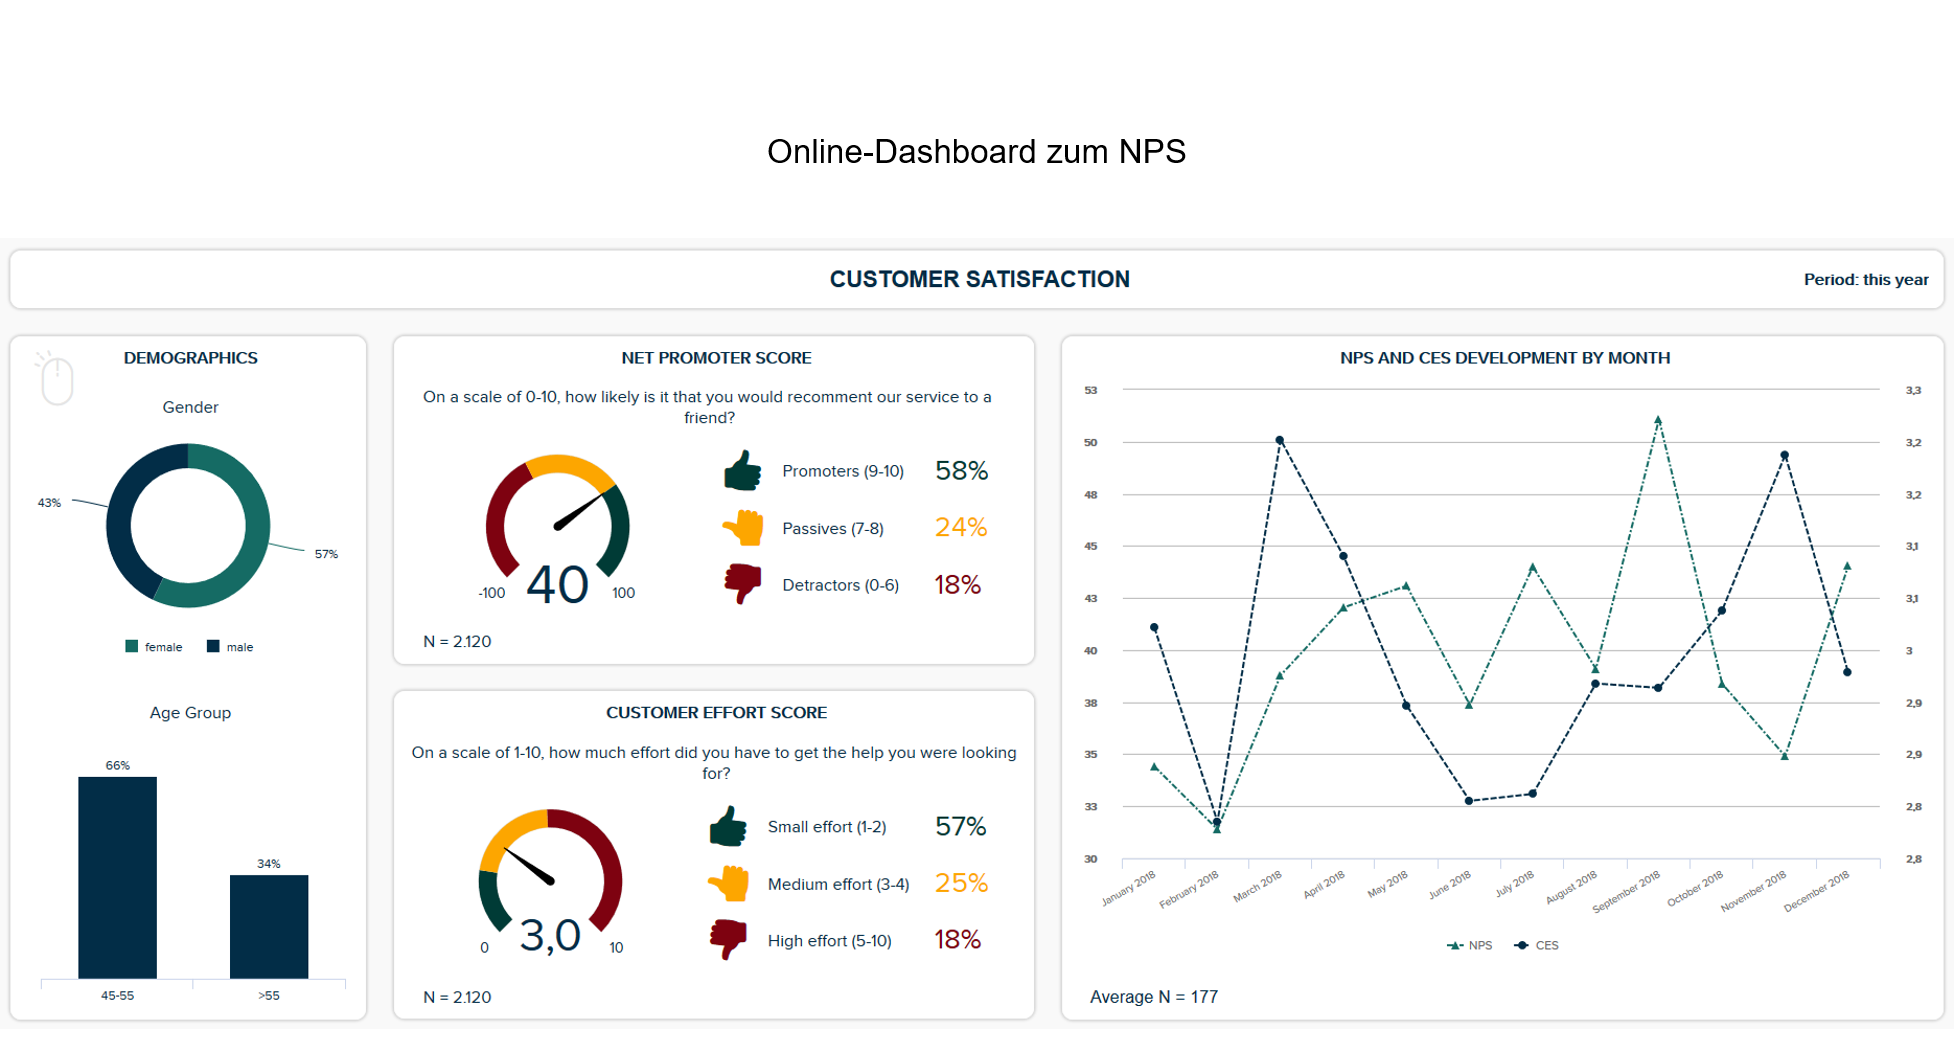 Online-Dashboard zum Net Promoter Score